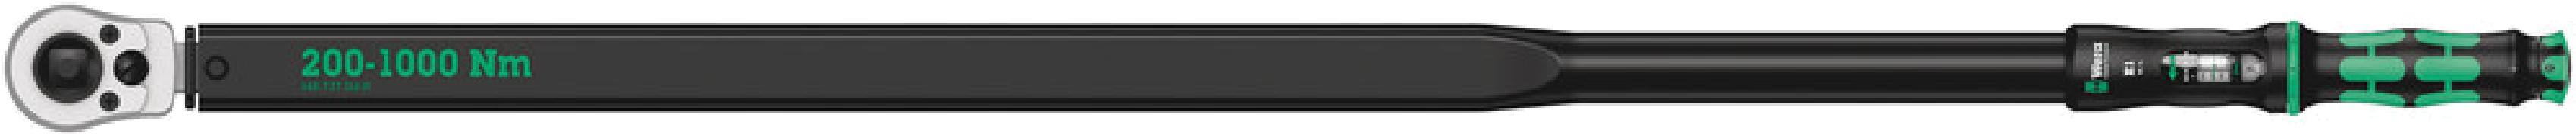 Clé dynamométrique à cliquet Click-Torque E1 Push R/L  - 05075631001 - Wera Tools